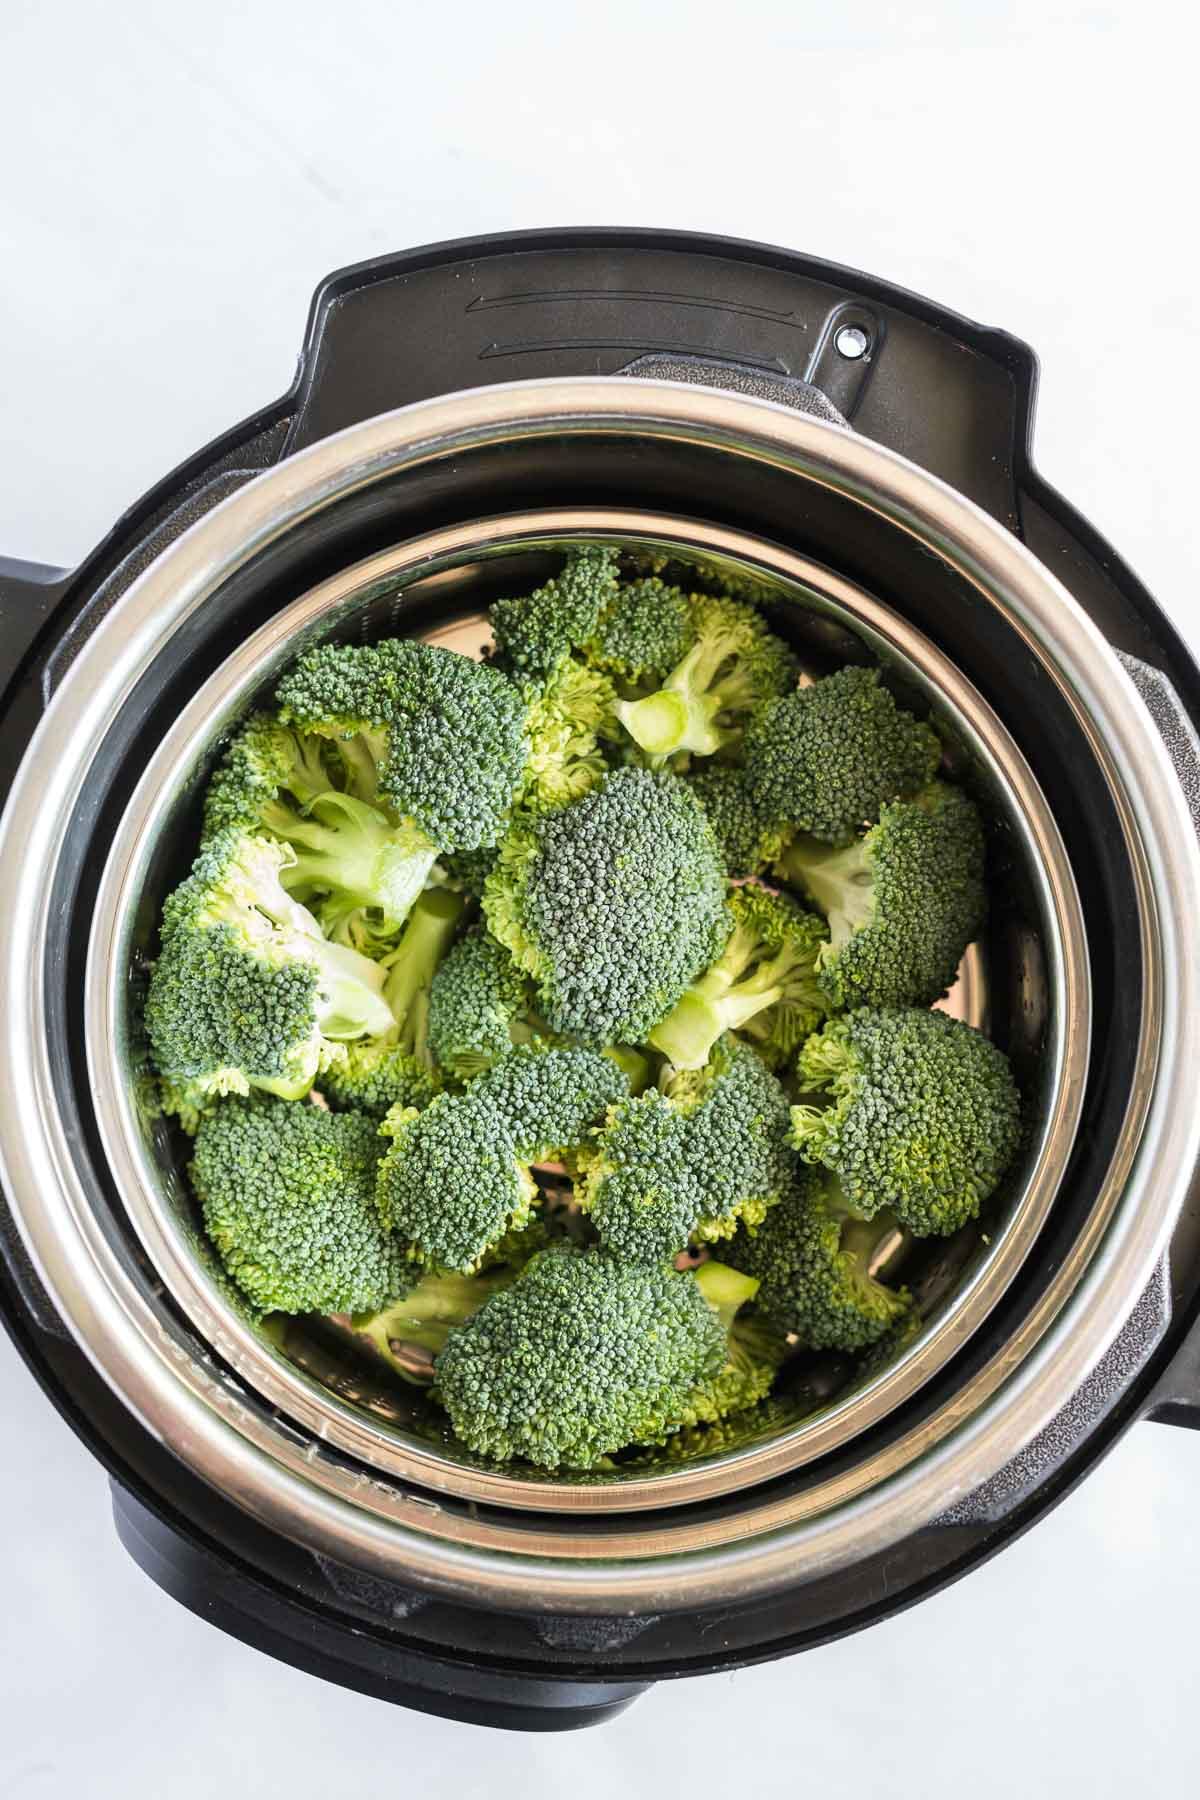 Raw broccoli florets in a steamer basket inside an instant pot.